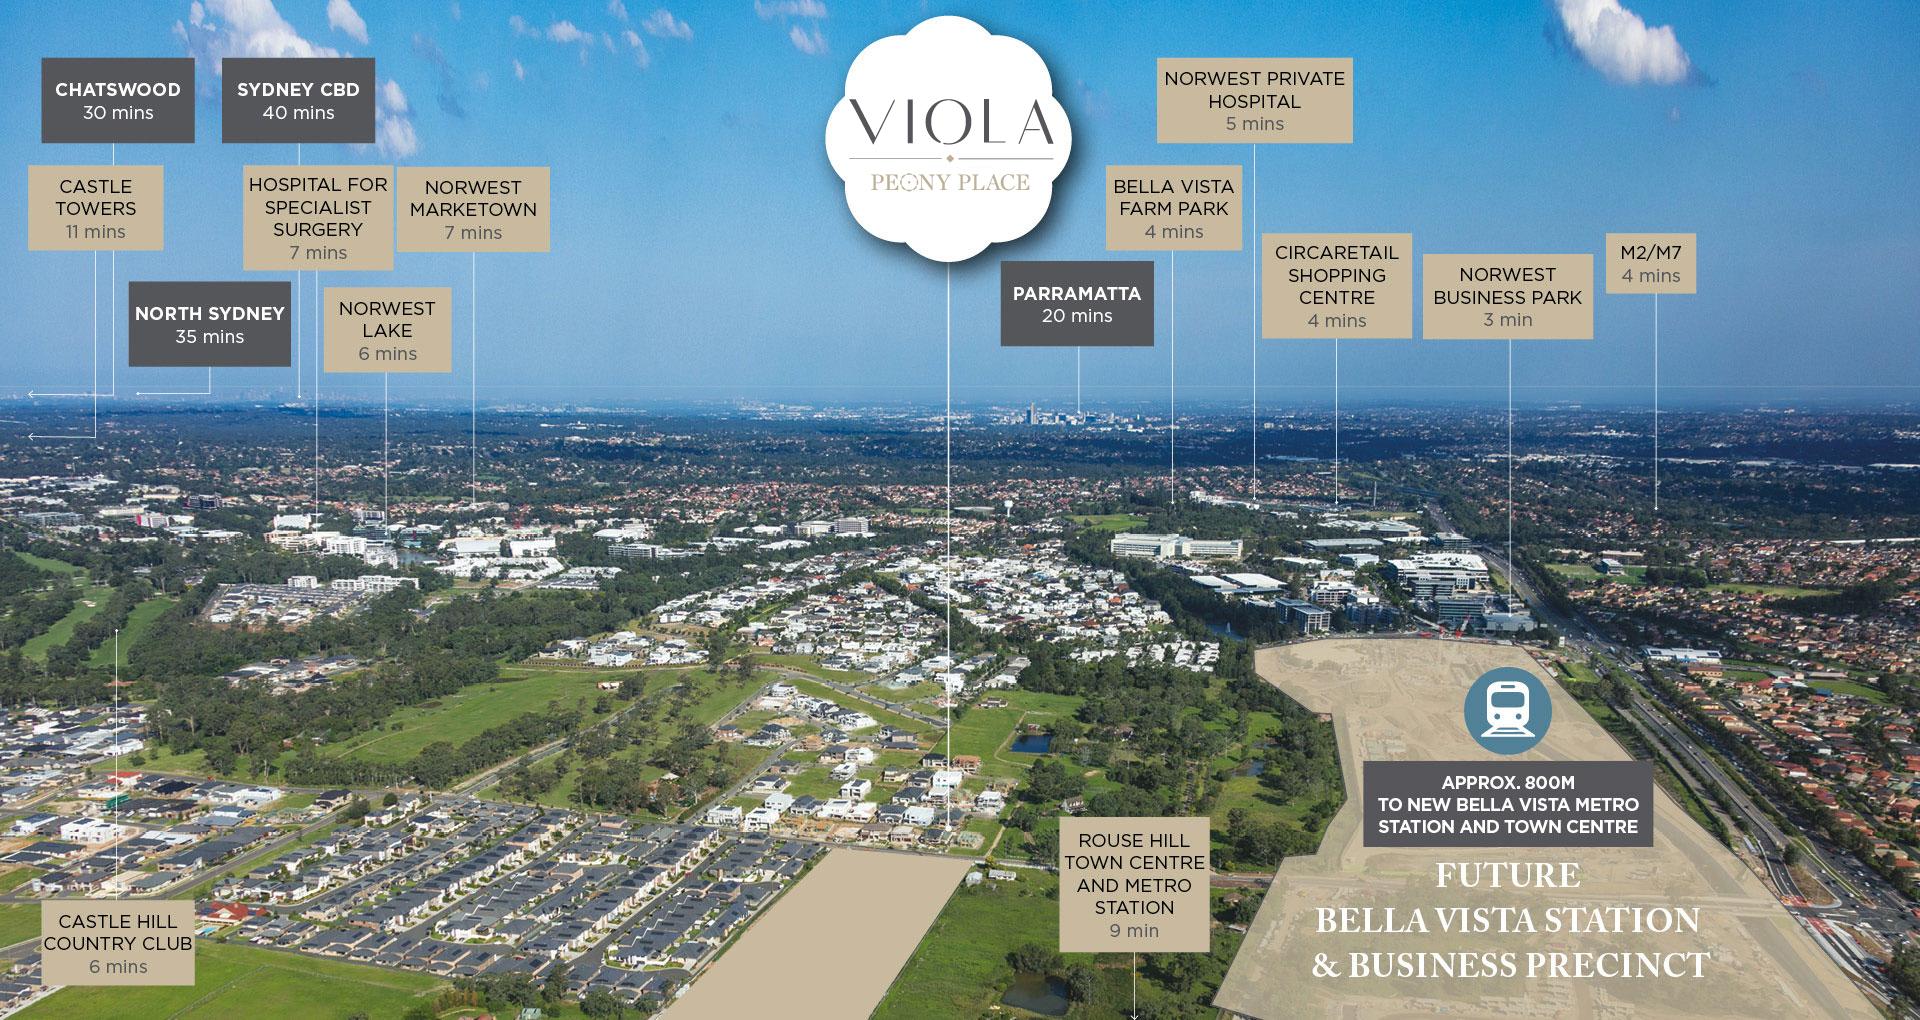 Viola Peony Place Kellyville